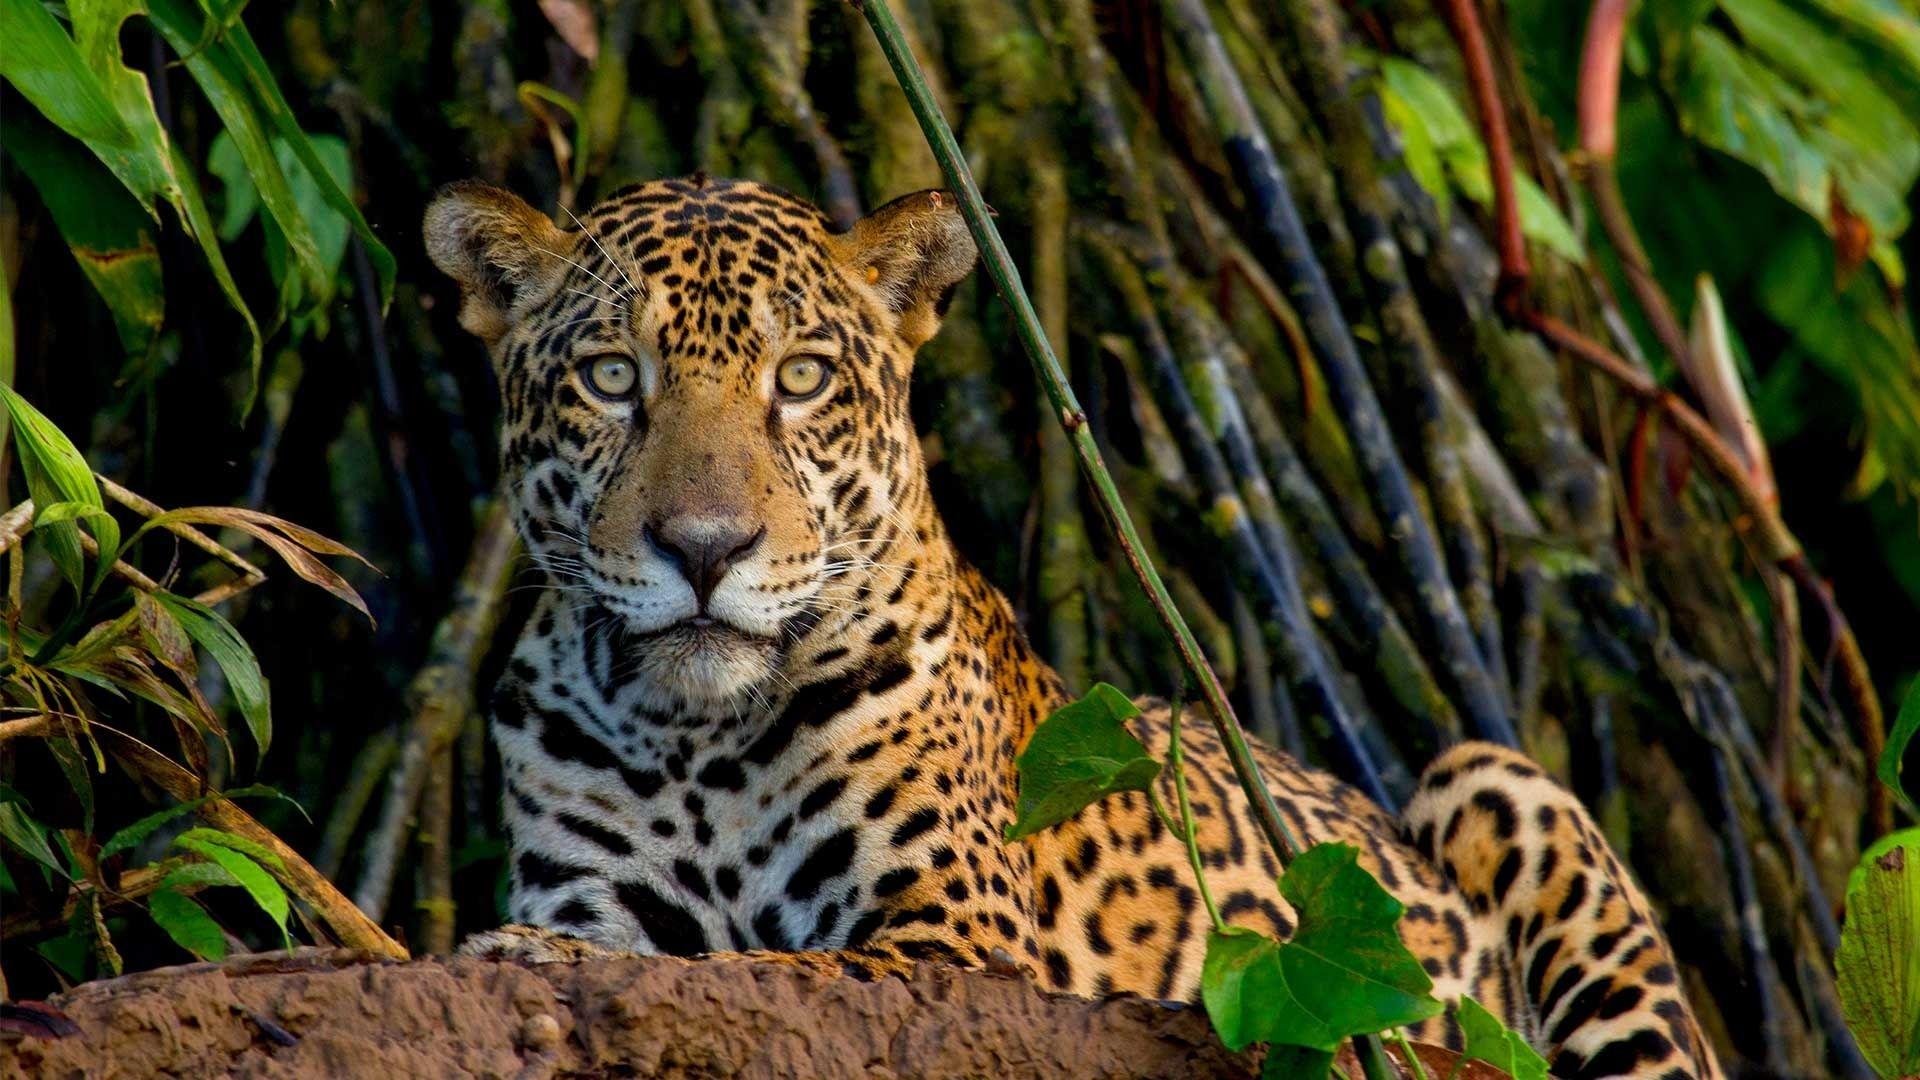 The mighty Jaguar (Photo Credit: Lucas Bustamante)